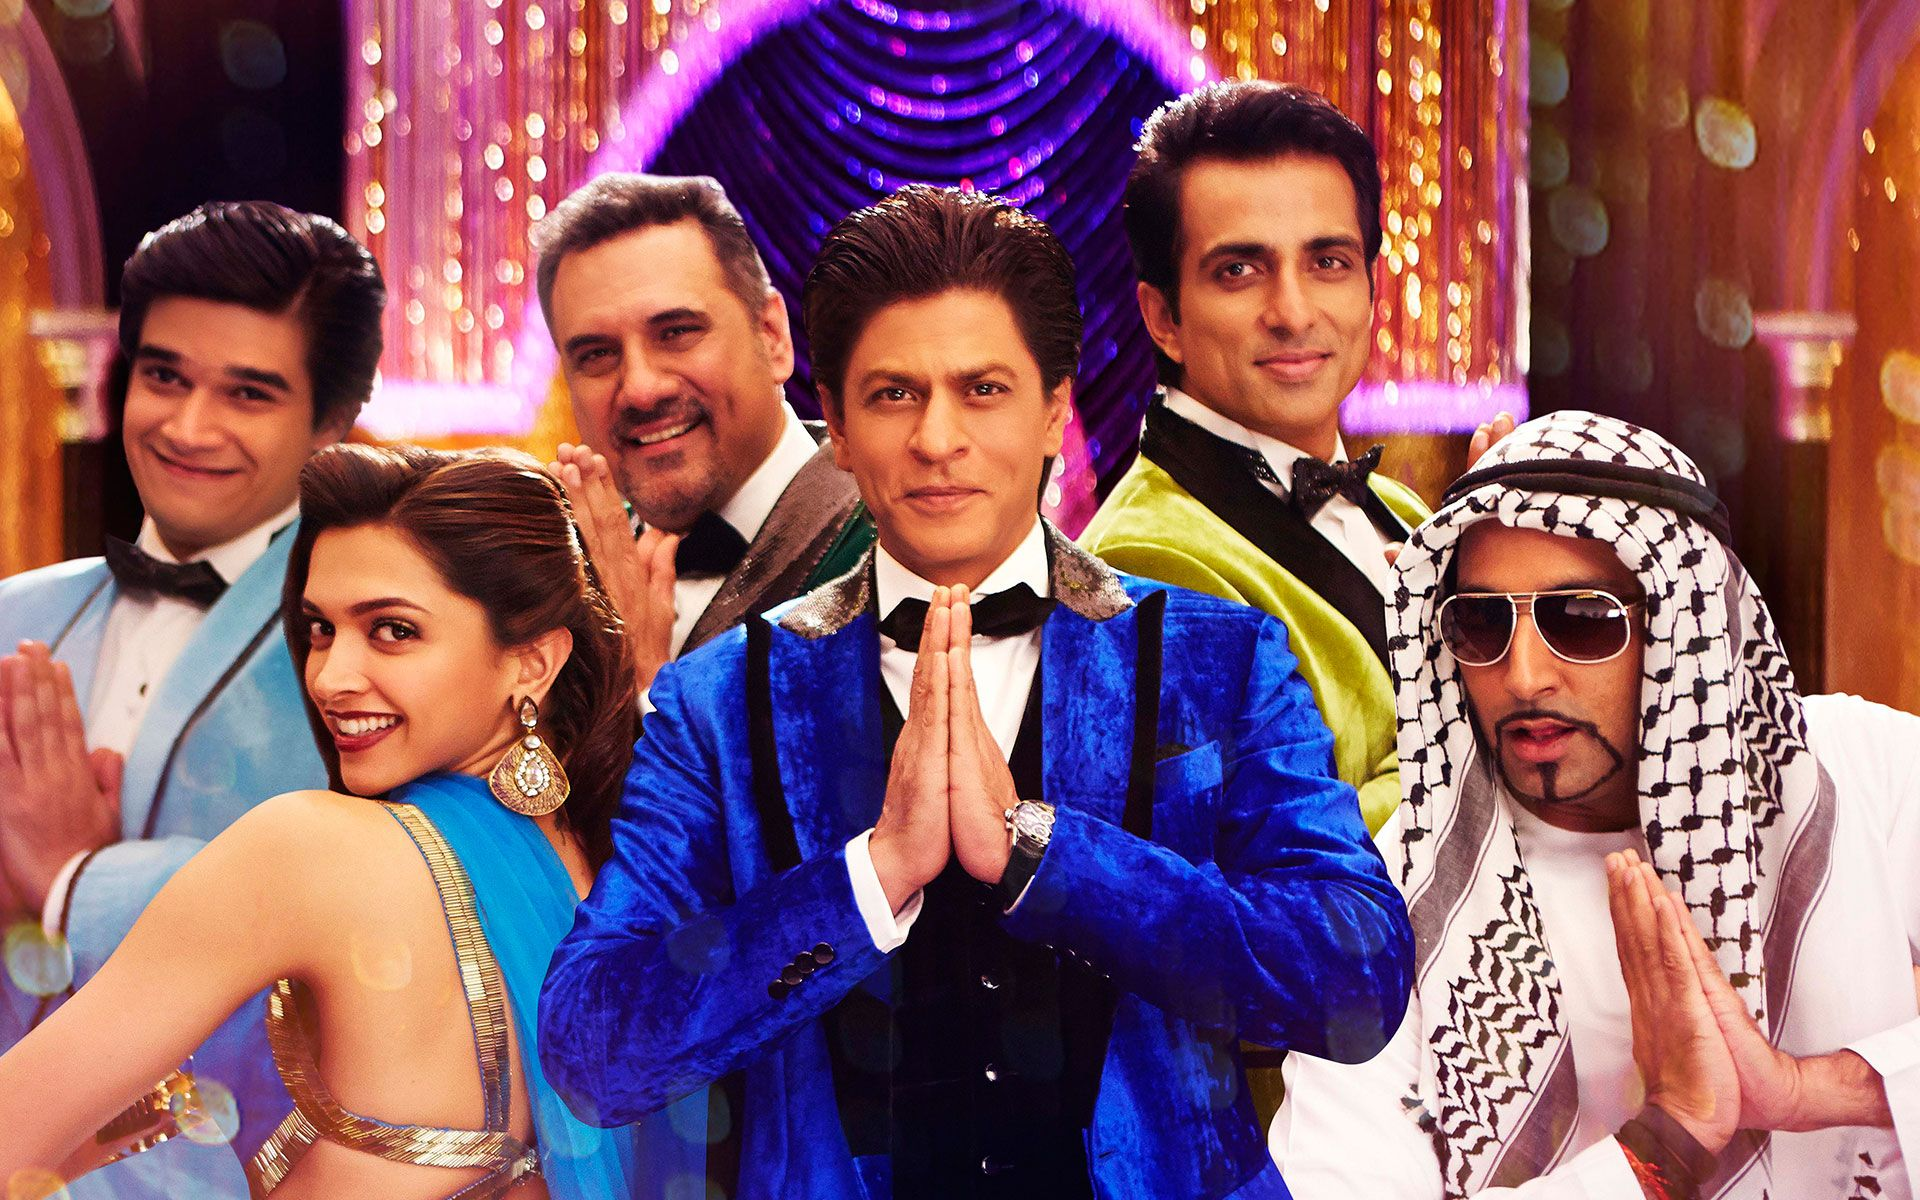 King Khan Kino Happy New Year Happy new year film